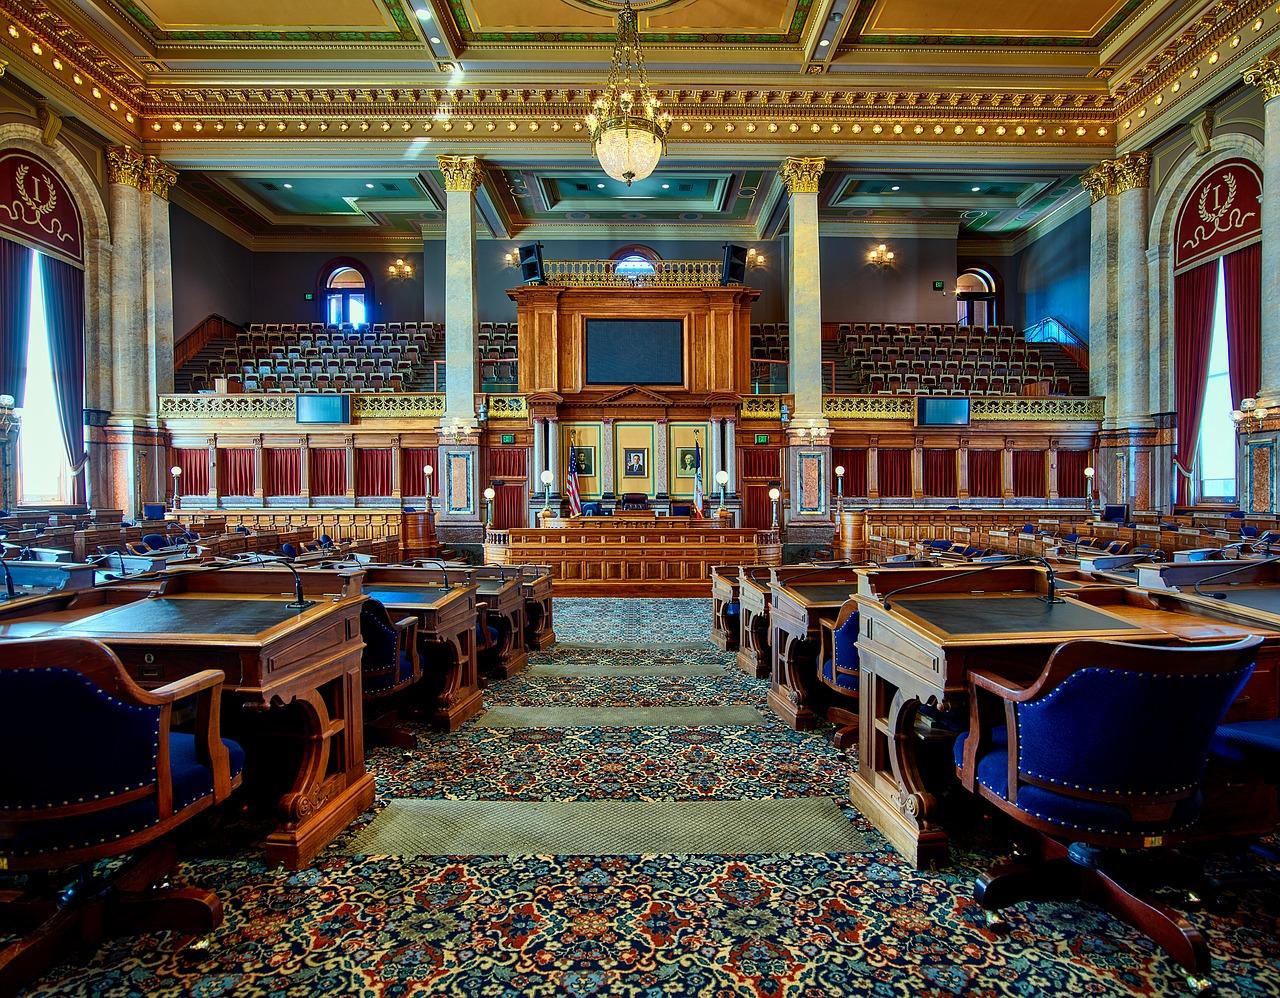 Older Iowans Legislature (OIL) Annual Meeting on Monday, September 27, 2021